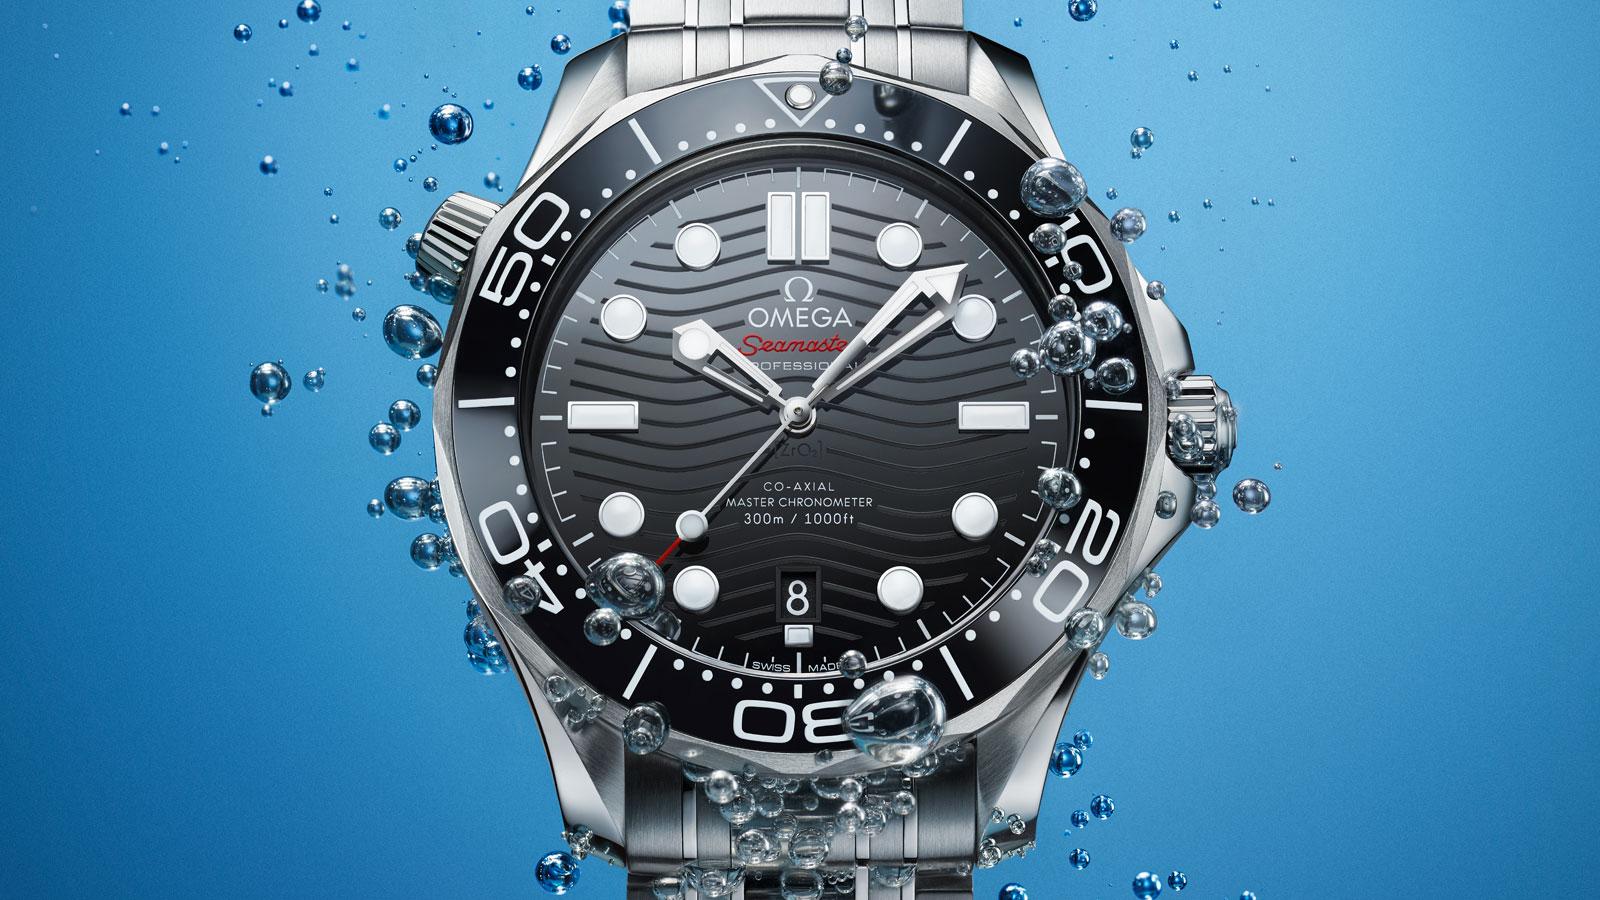 Seamaster 300米潜水表 300米潜水表 欧米茄同轴•至臻天文台表42毫米 腕表 - 210.30.42.20.01.001